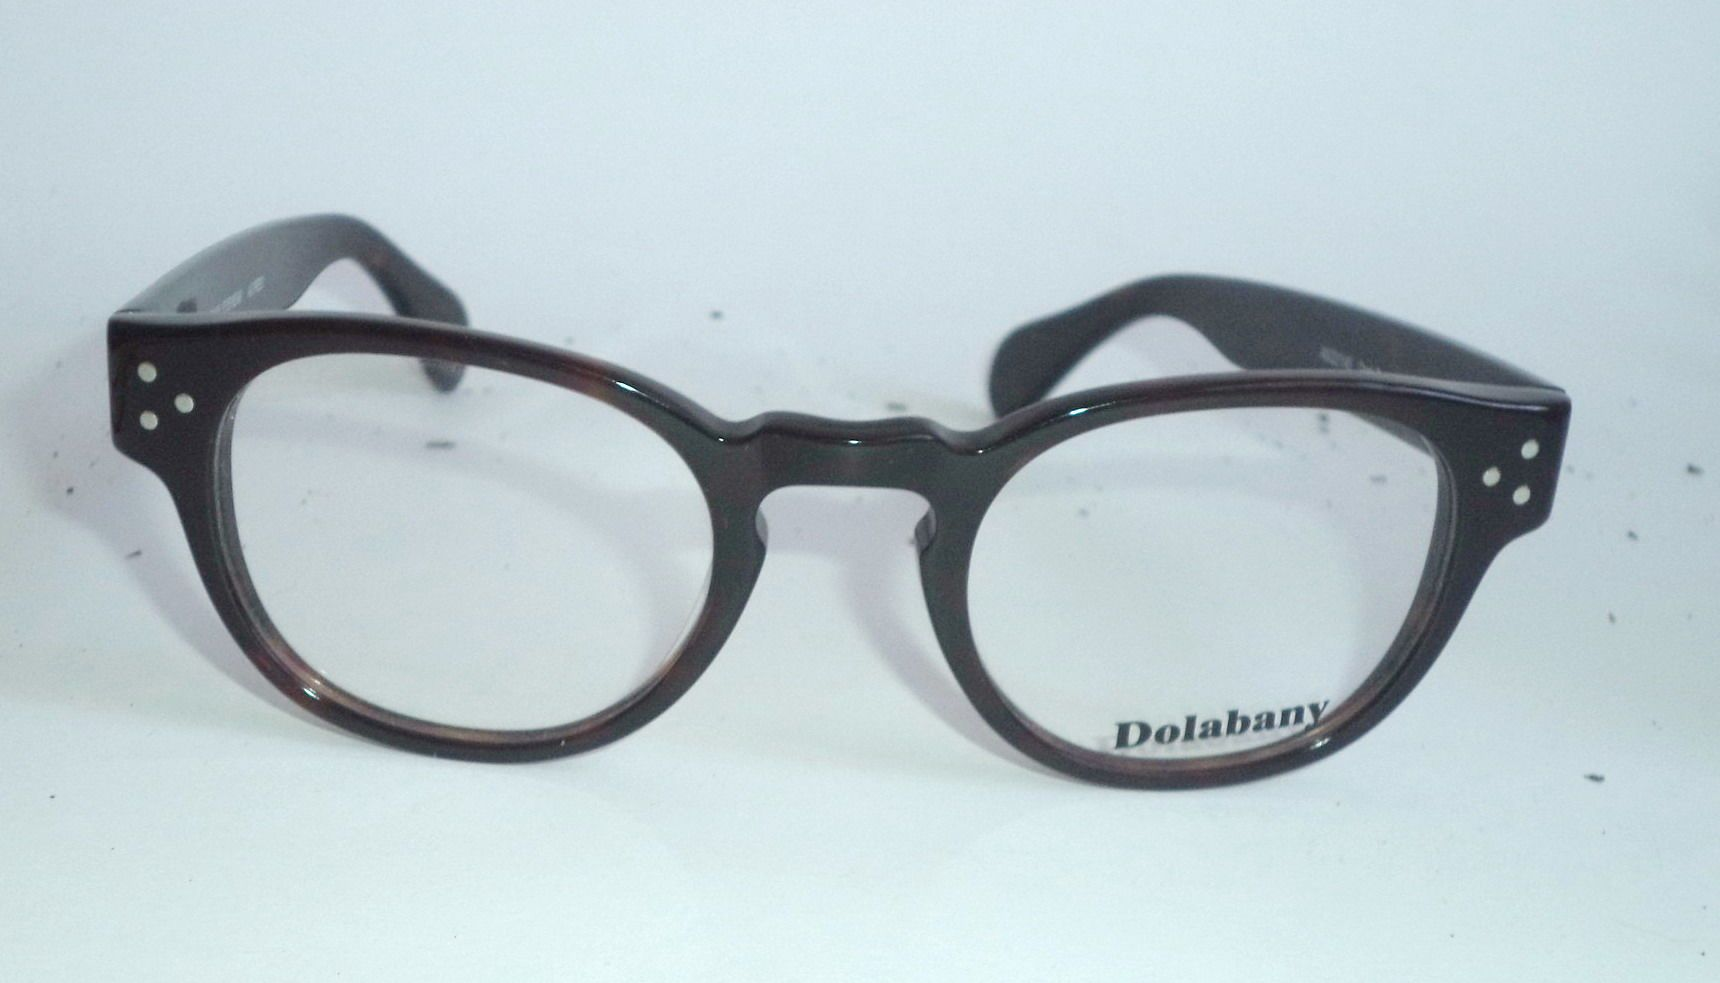 Dolabany Alfred New Retro Eyeglasses Tortoise Handmade tart horn rim ...